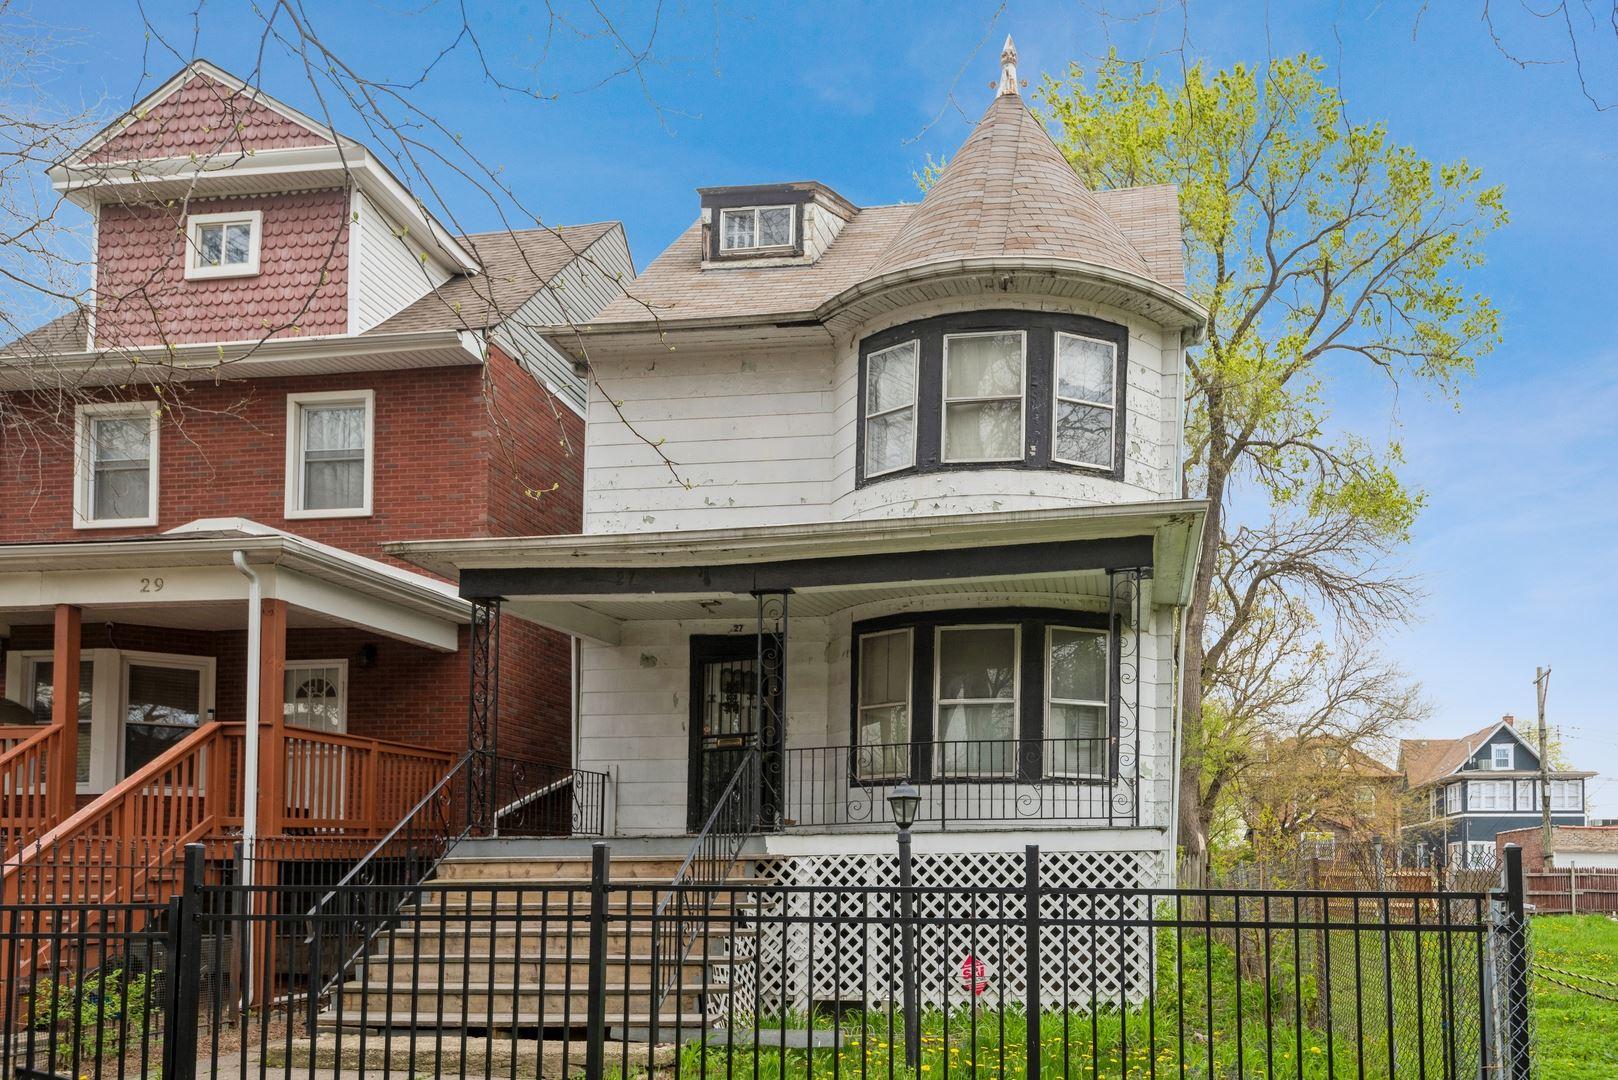 27 N Lockwood Avenue, Chicago, IL 60644 - #: 11073354